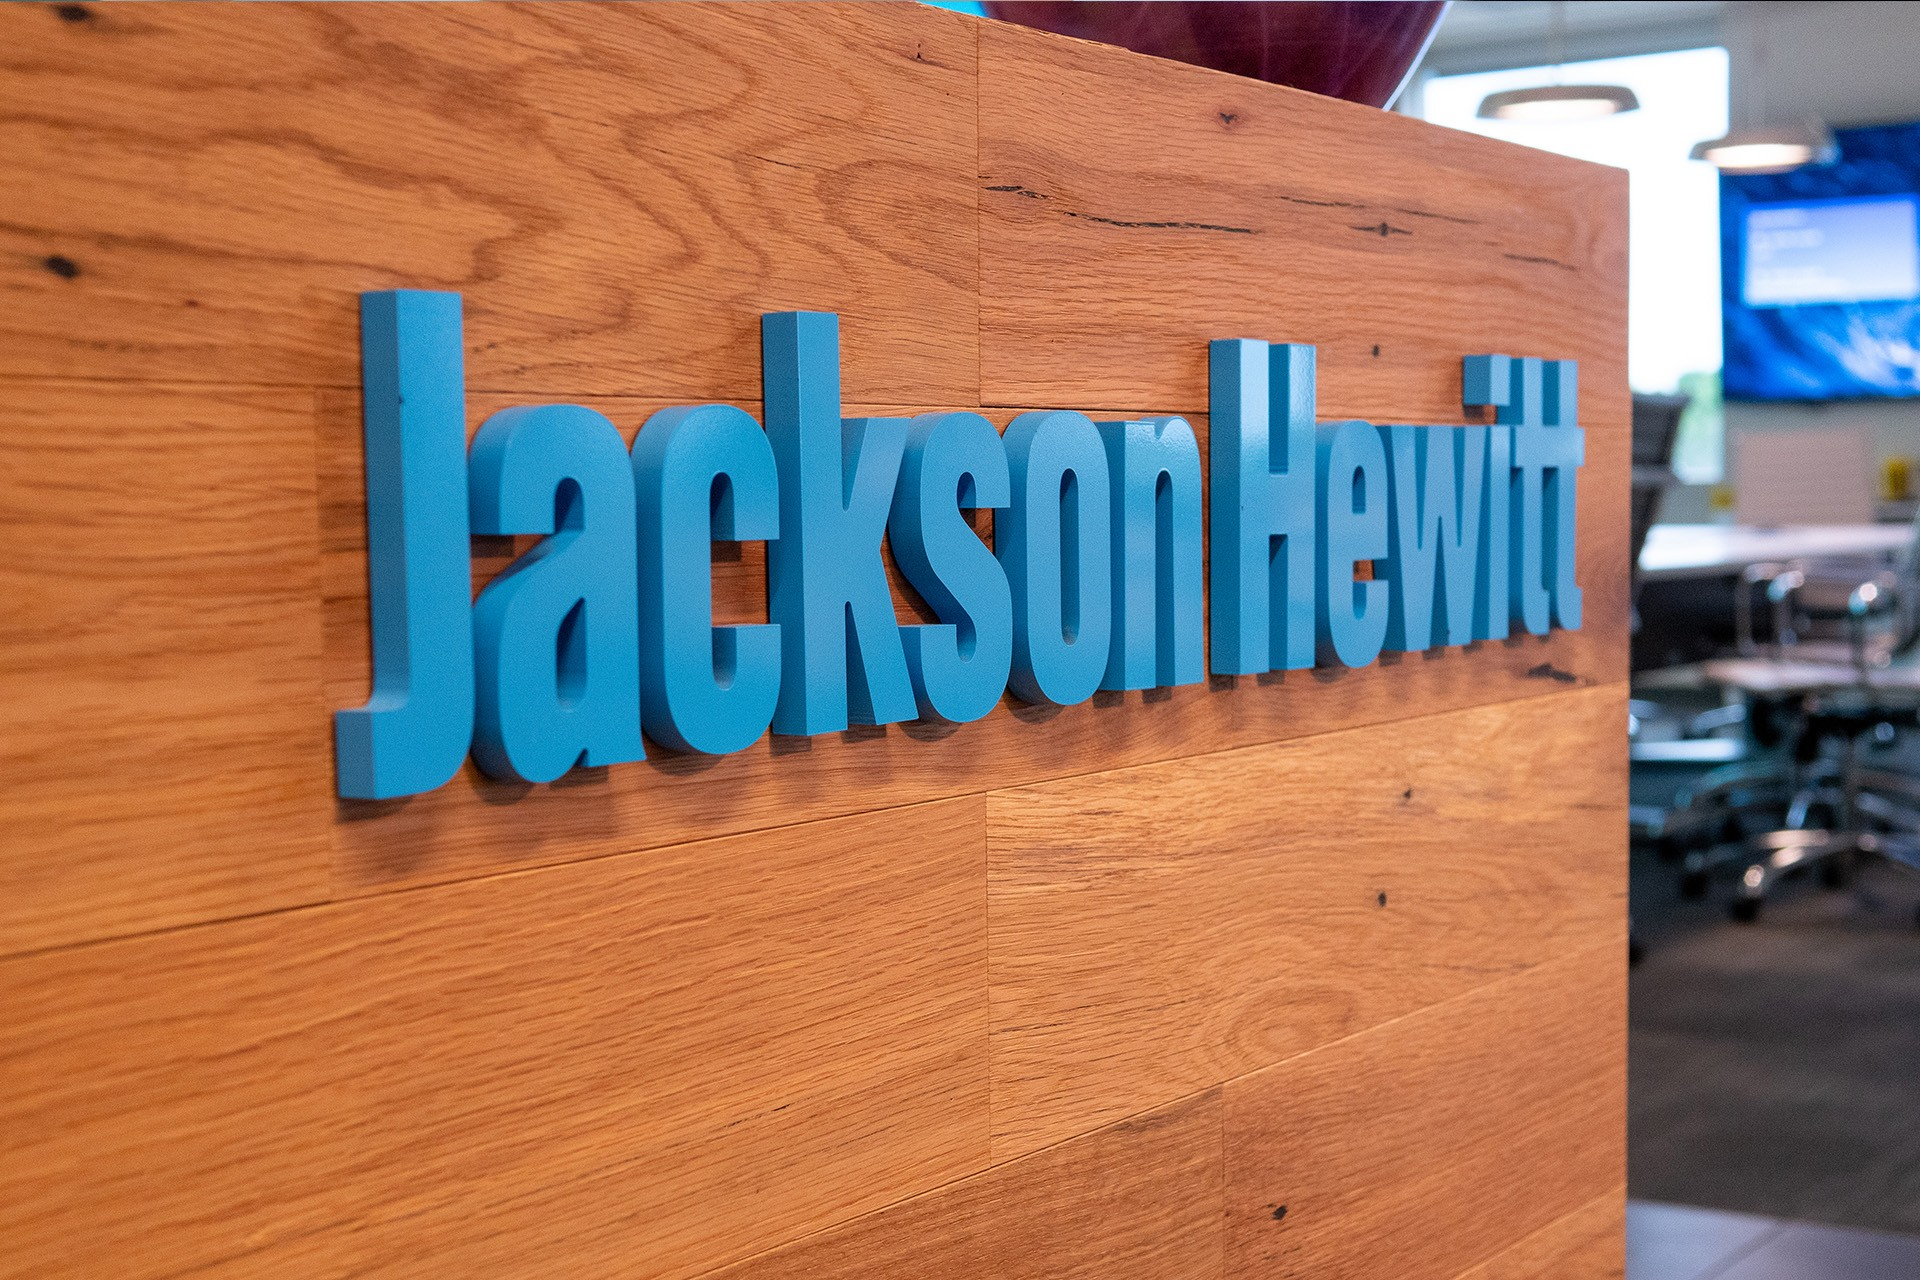 Jackson Hewitt Jobs and Company Culture